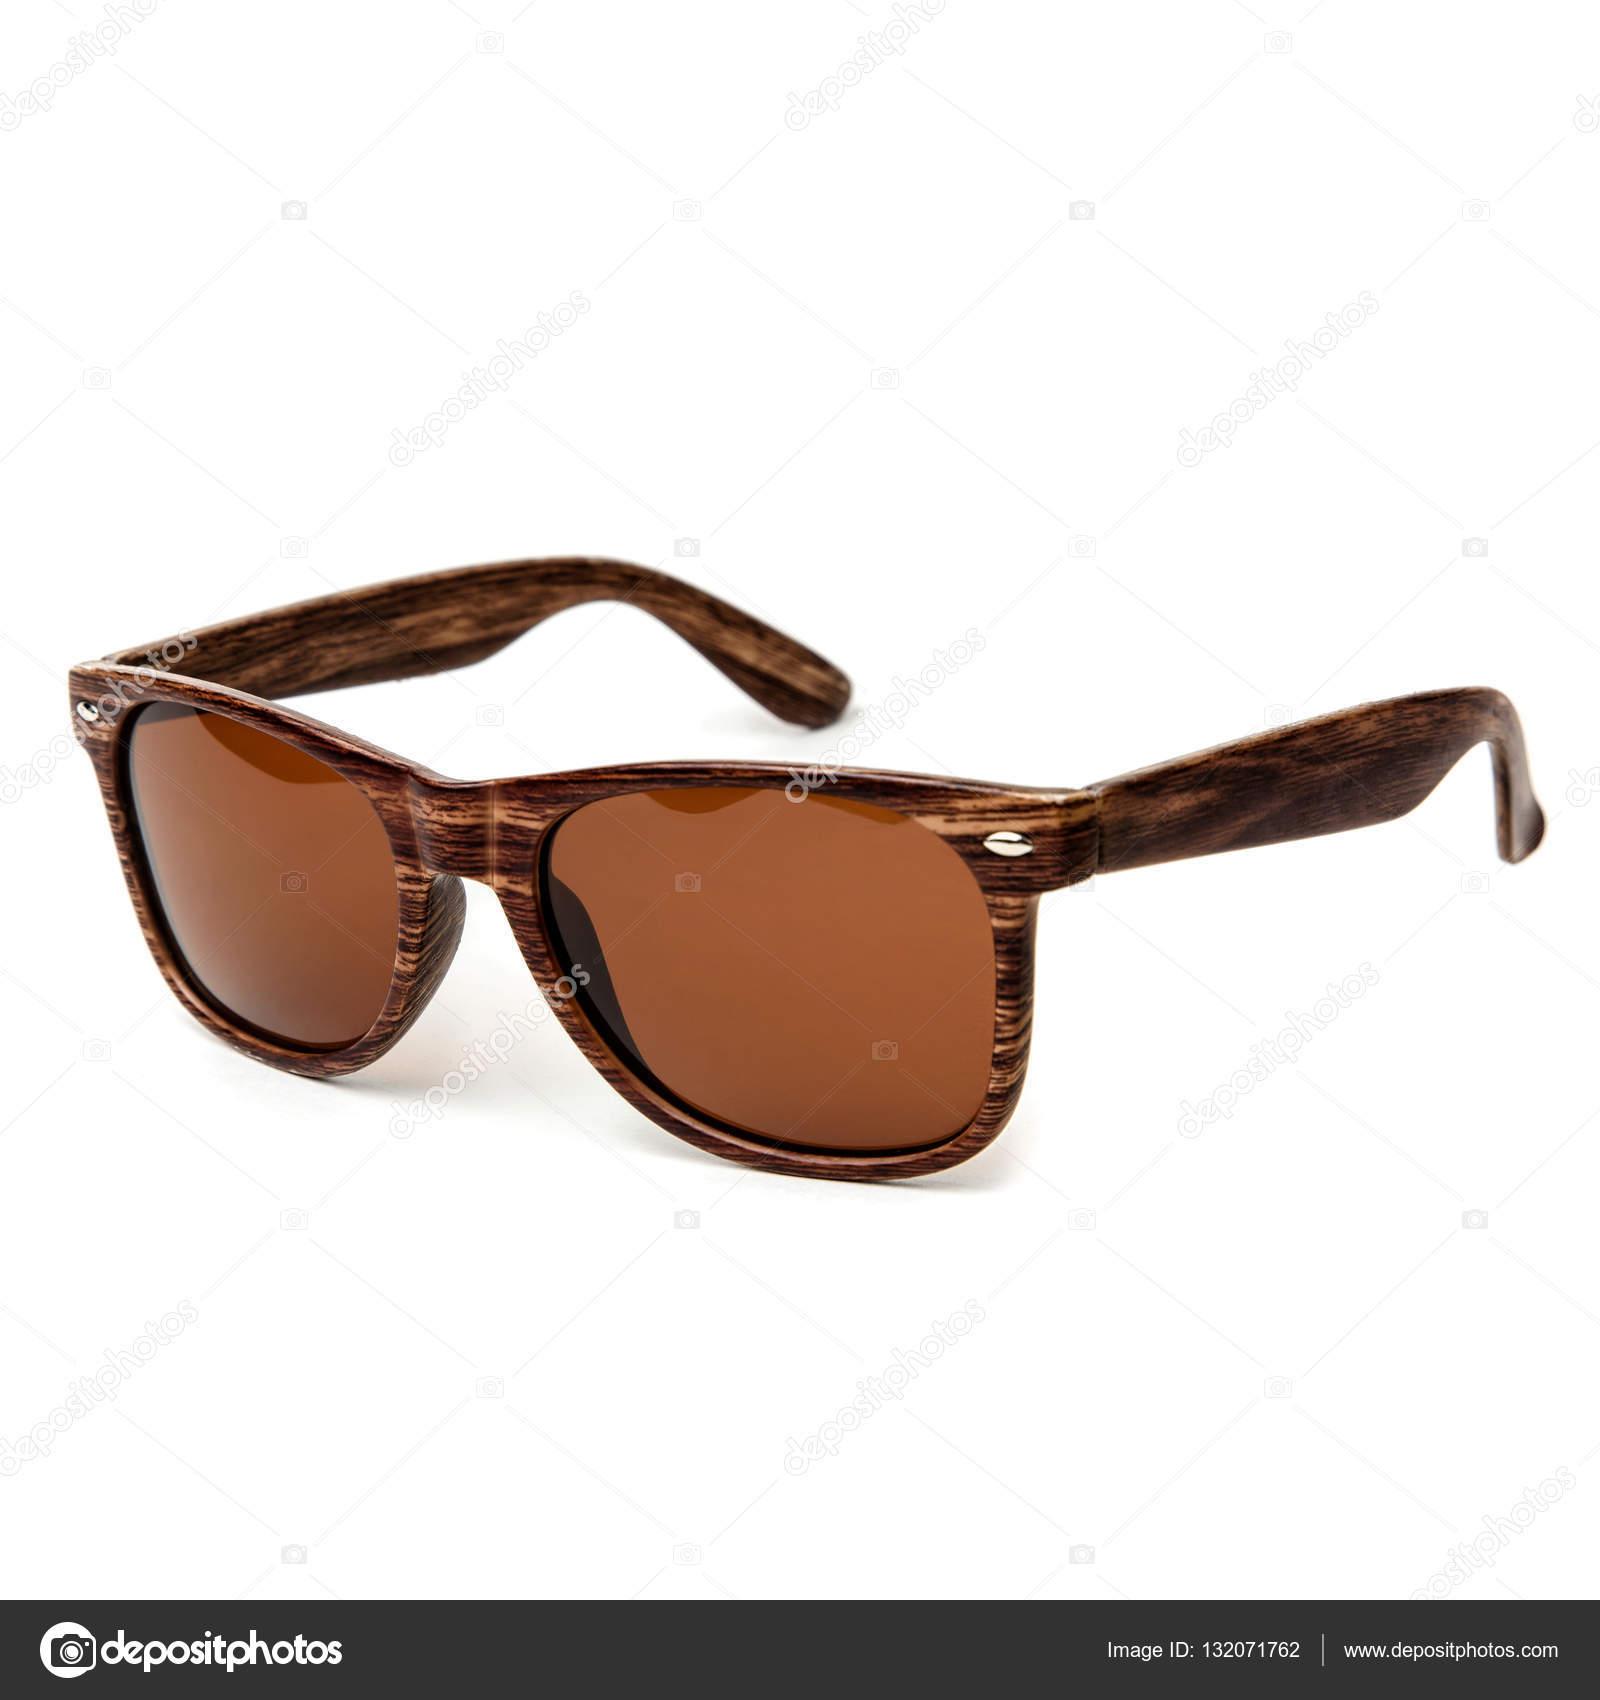 2e2735702a Gafas de sol de madera aisladas sobre fondo blanco en un estudio de disparo  — Foto